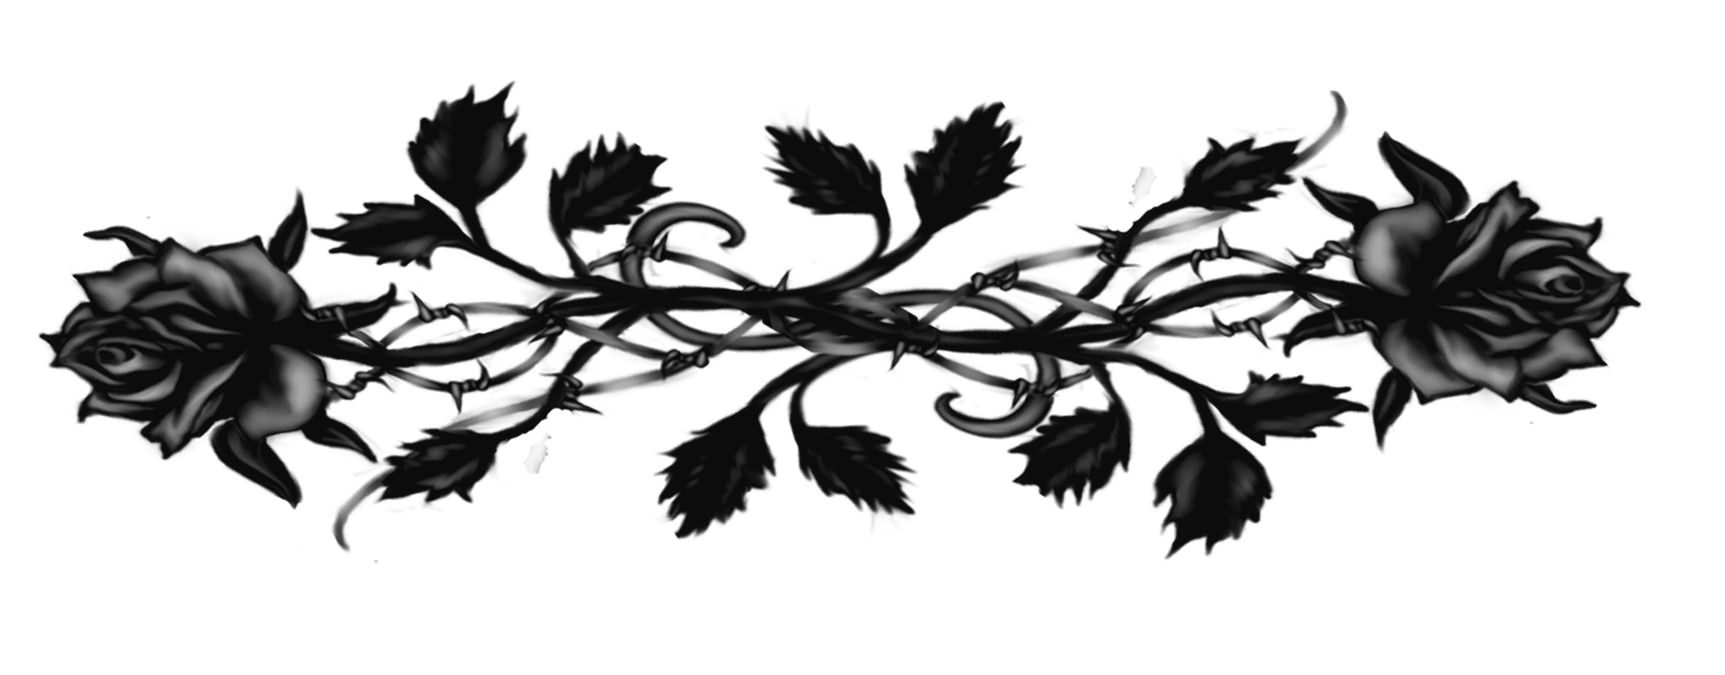 Black Rose Gothic Tattoo Design Tattoobite Com Gothic Tattoo Gothic Rose Rose Tattoos